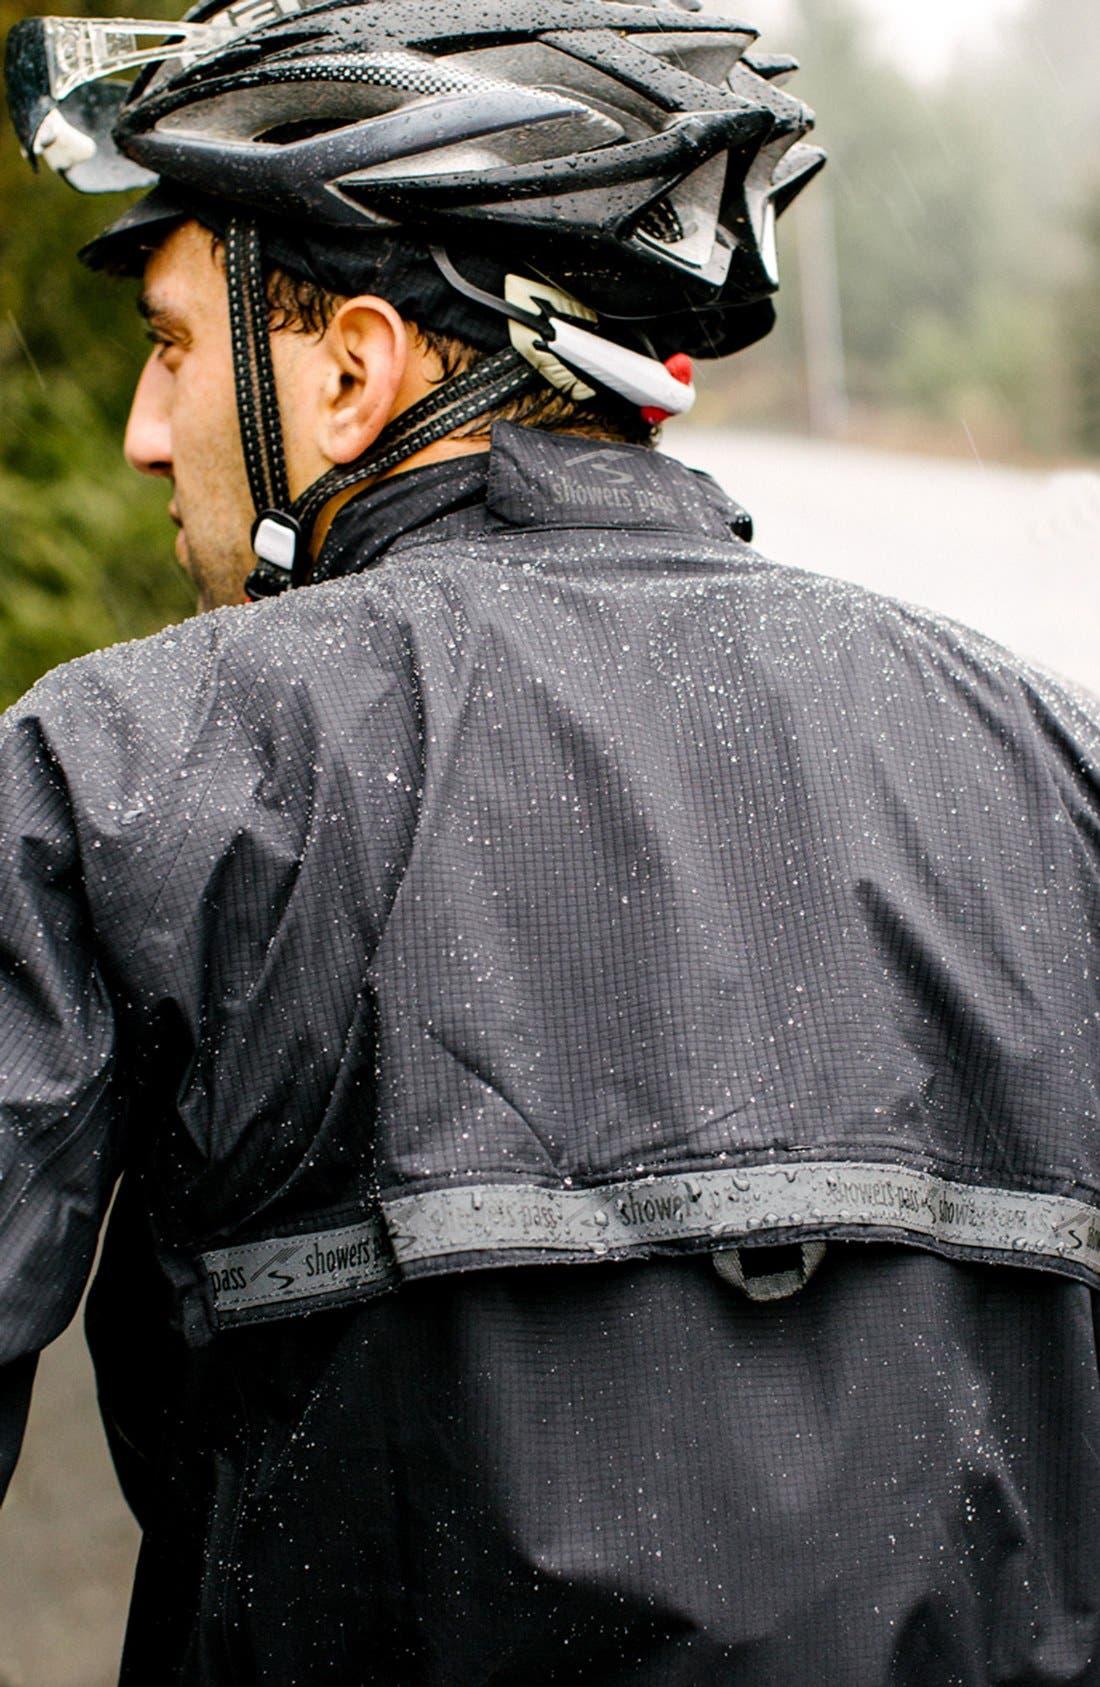 SHOWERS PASS,                             'Elite 2.1' Trim Fit Waterproof Hooded Jacket,                             Alternate thumbnail 2, color,                             001